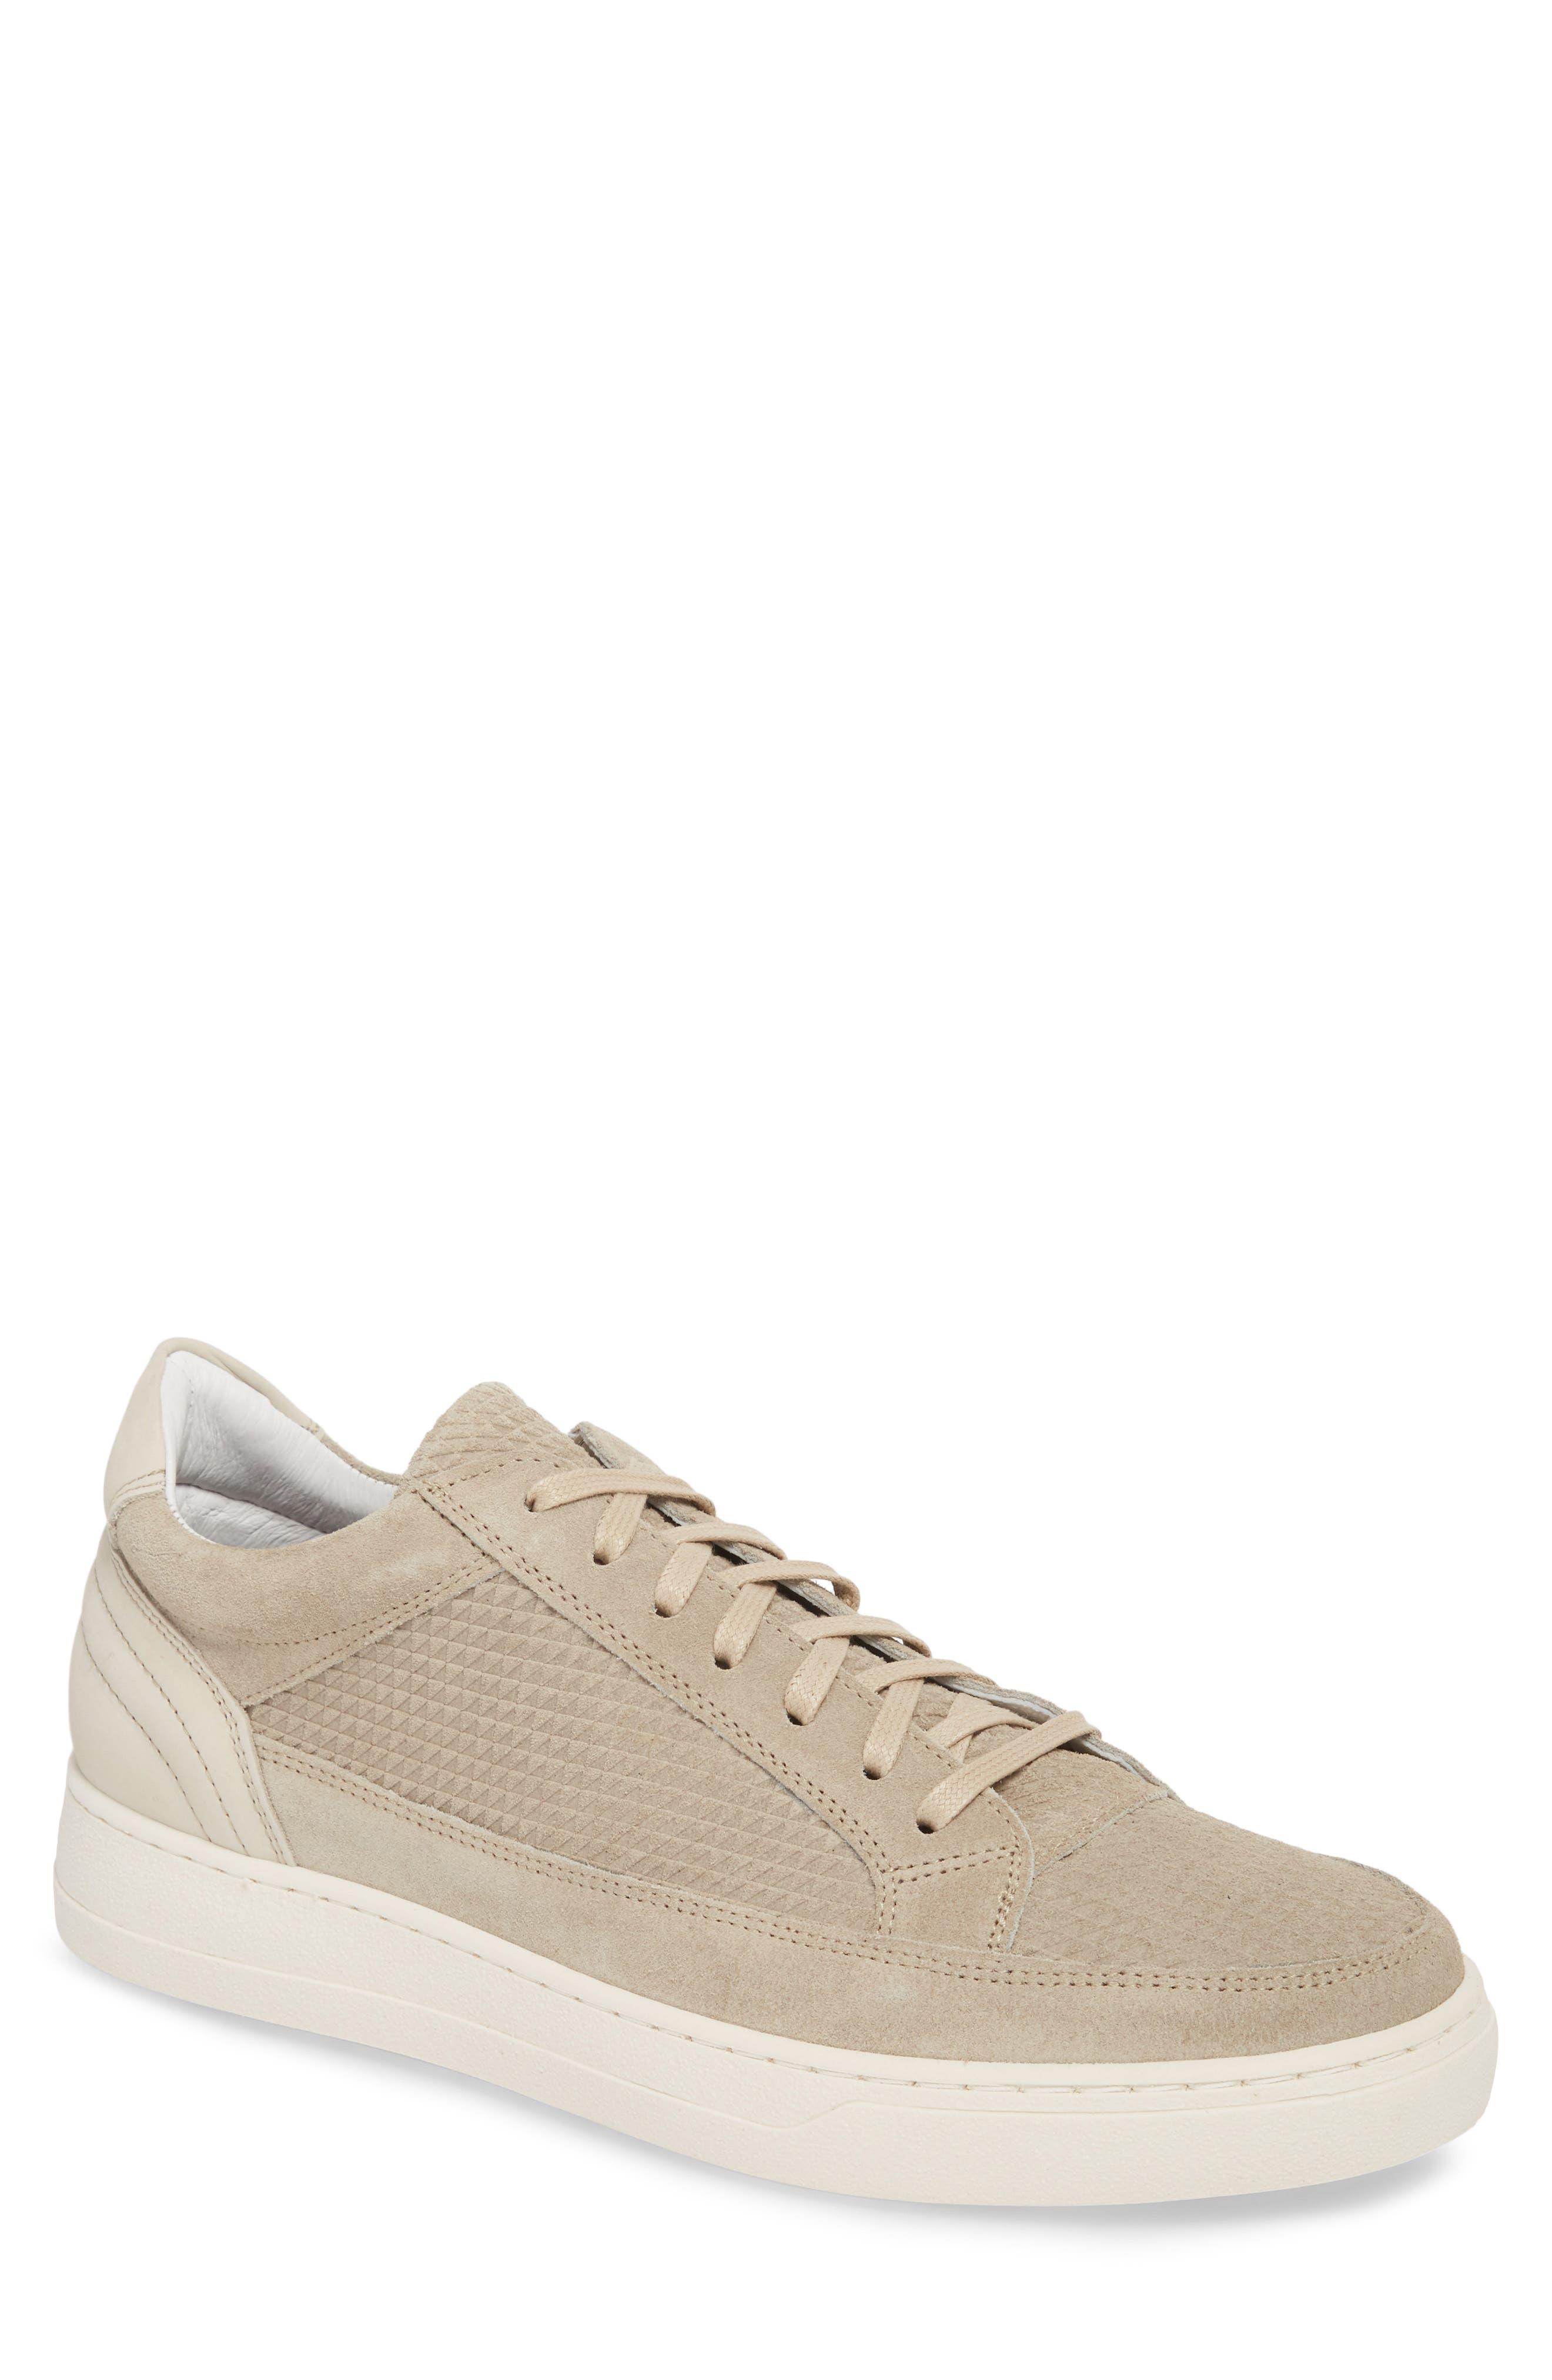 Pajar Men's Reid Embossed Water Resistant Sneaker SPL75